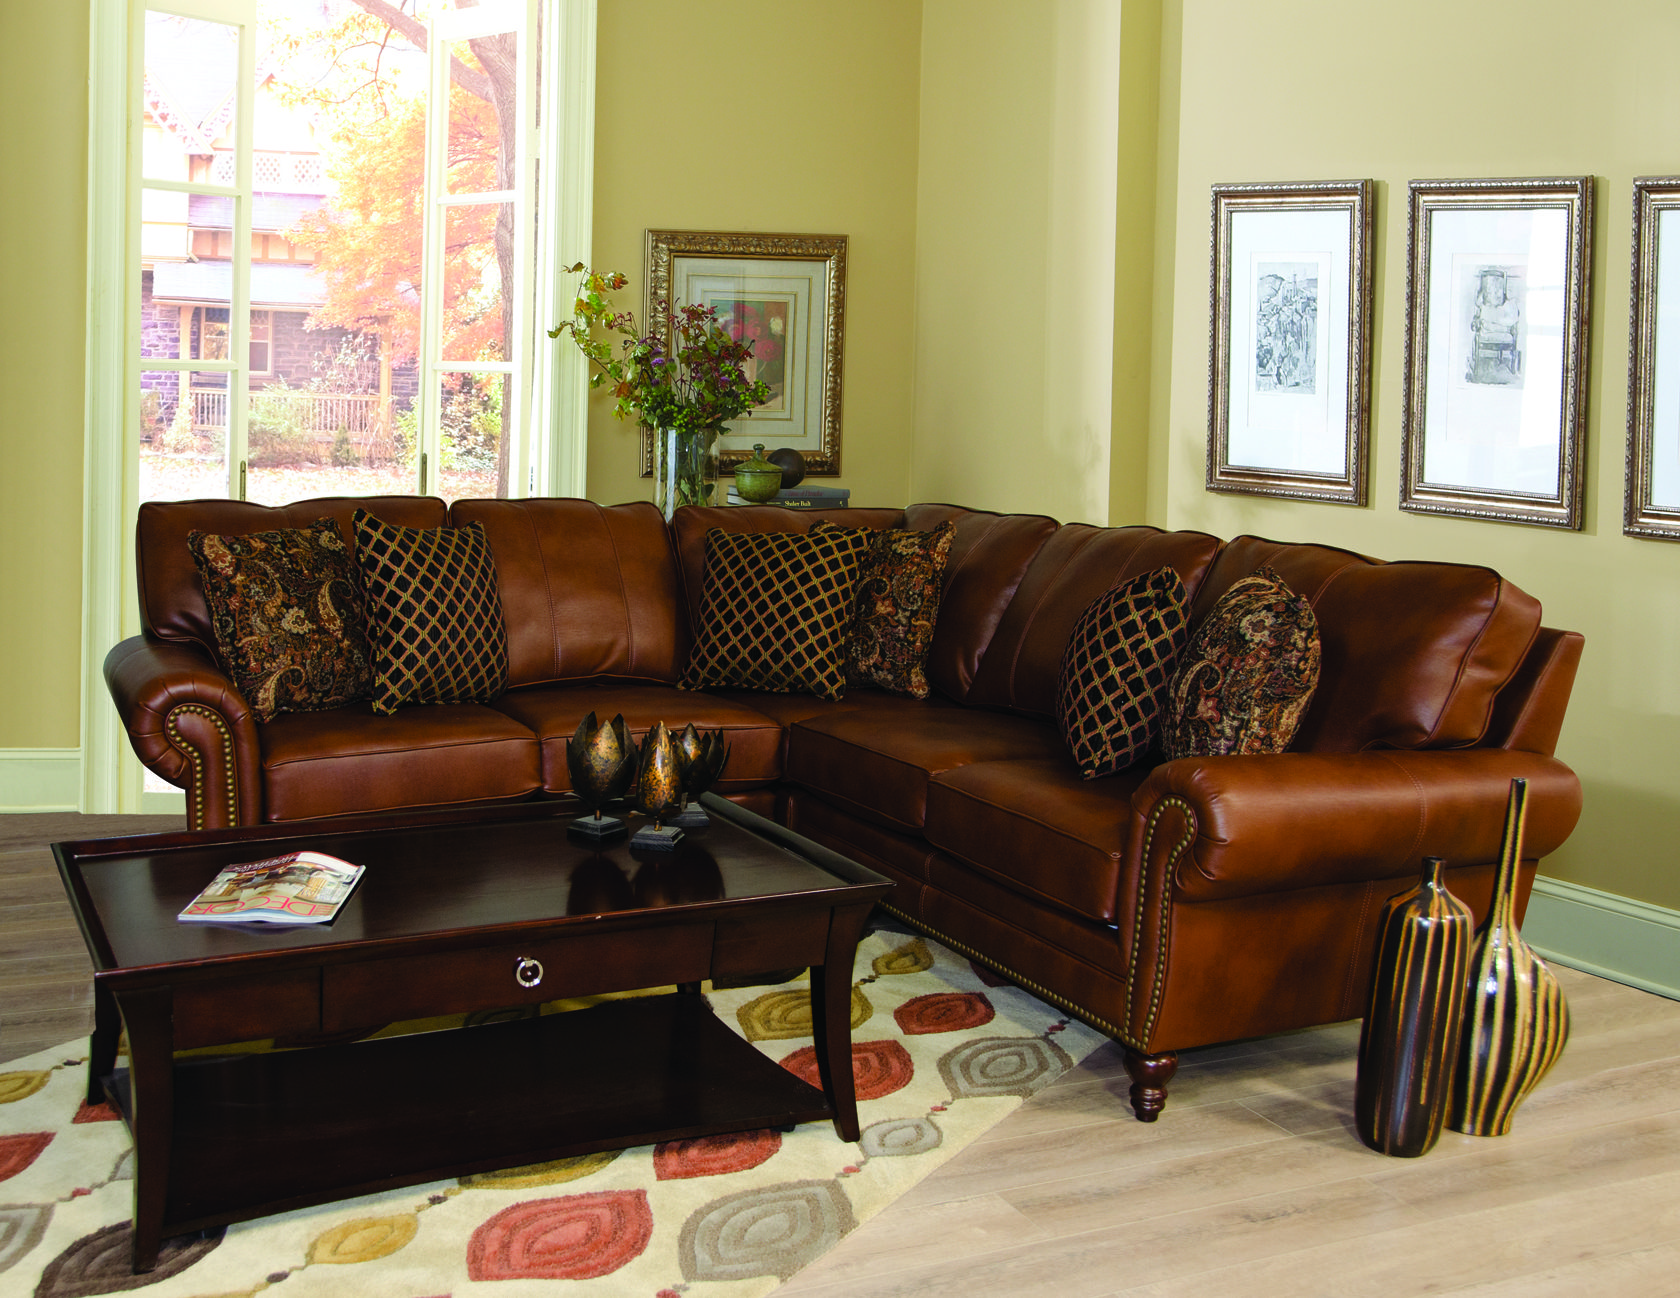 England Furniture 7160 27 7160 22 7160 28 with Roman Auburn